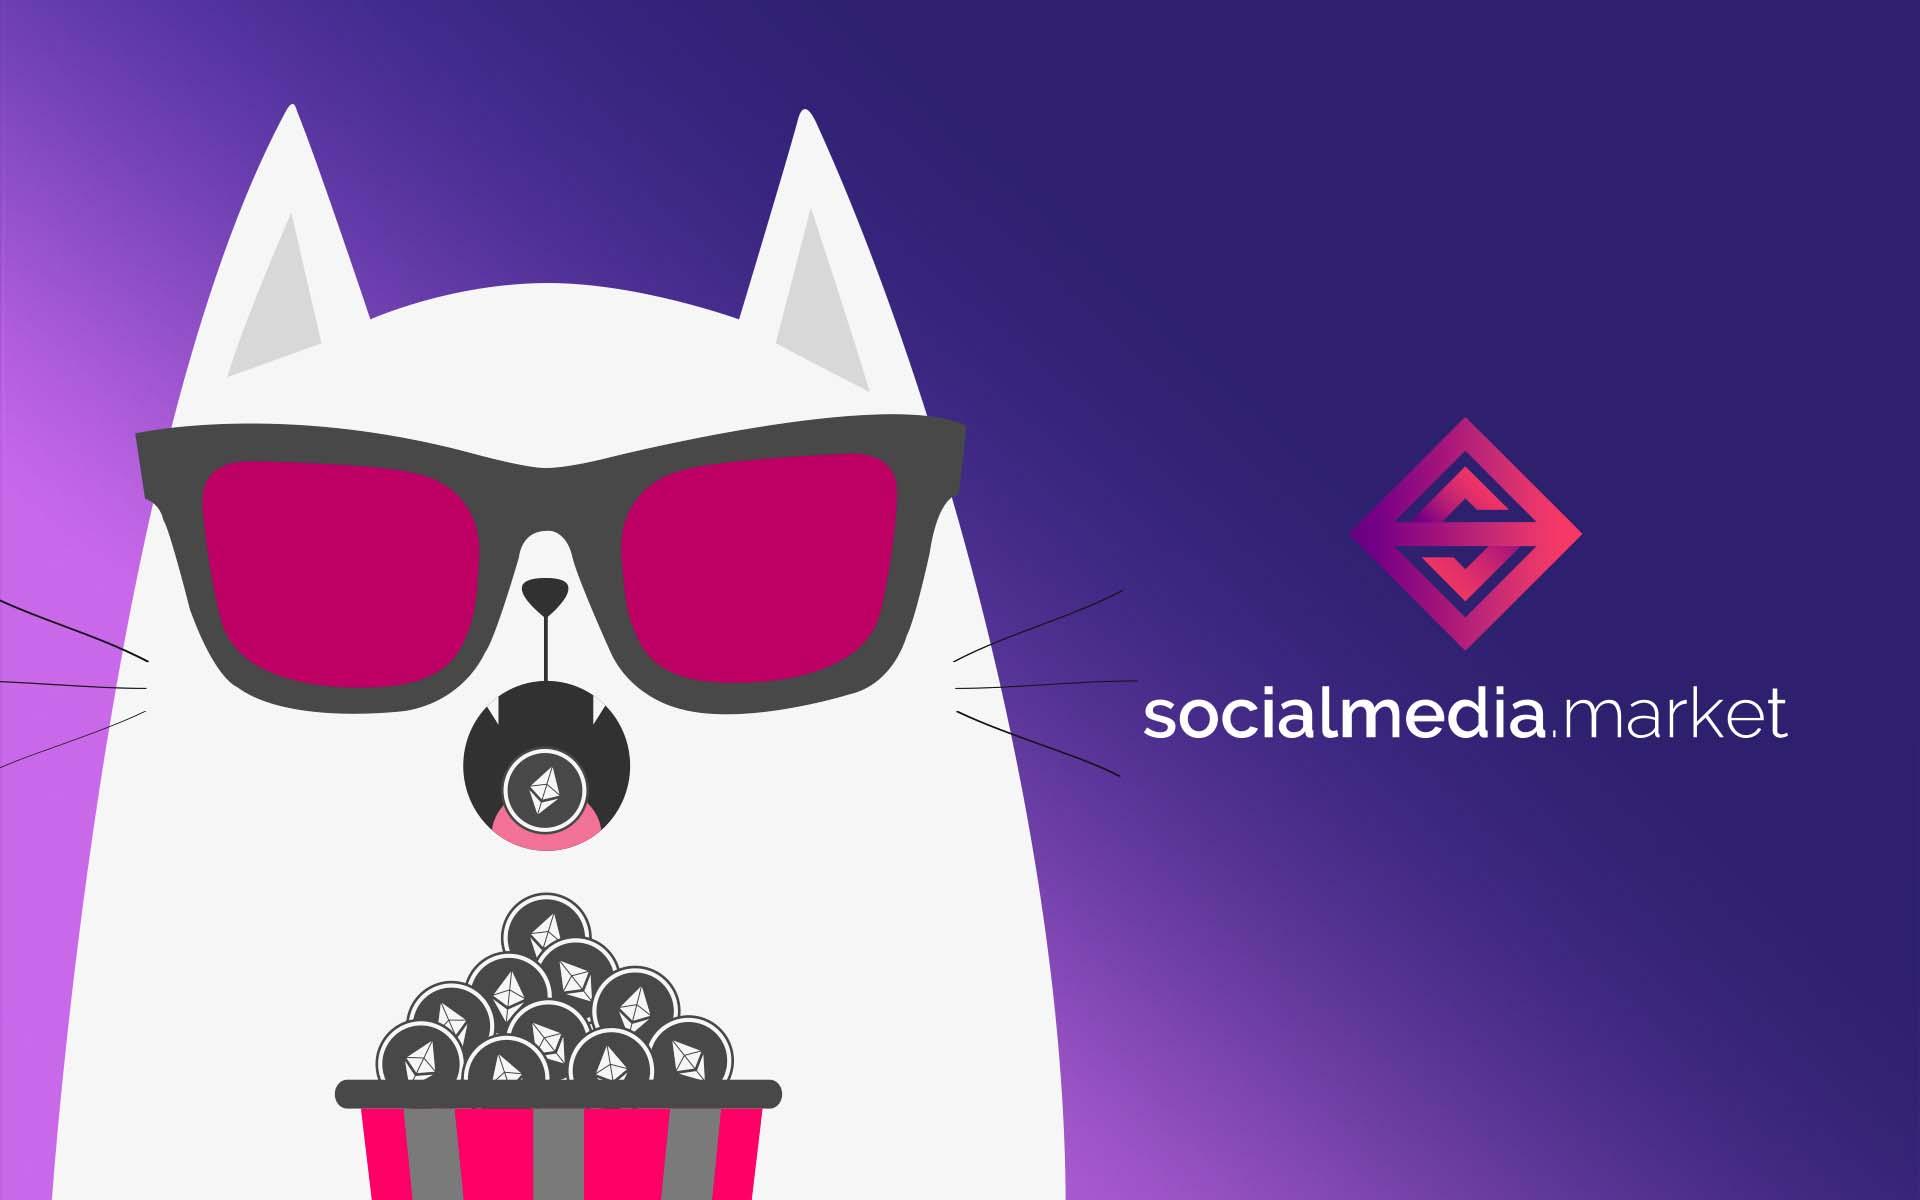 Get Meowed! SocialMedia.Market Rewards Contributors with CryptoKitties